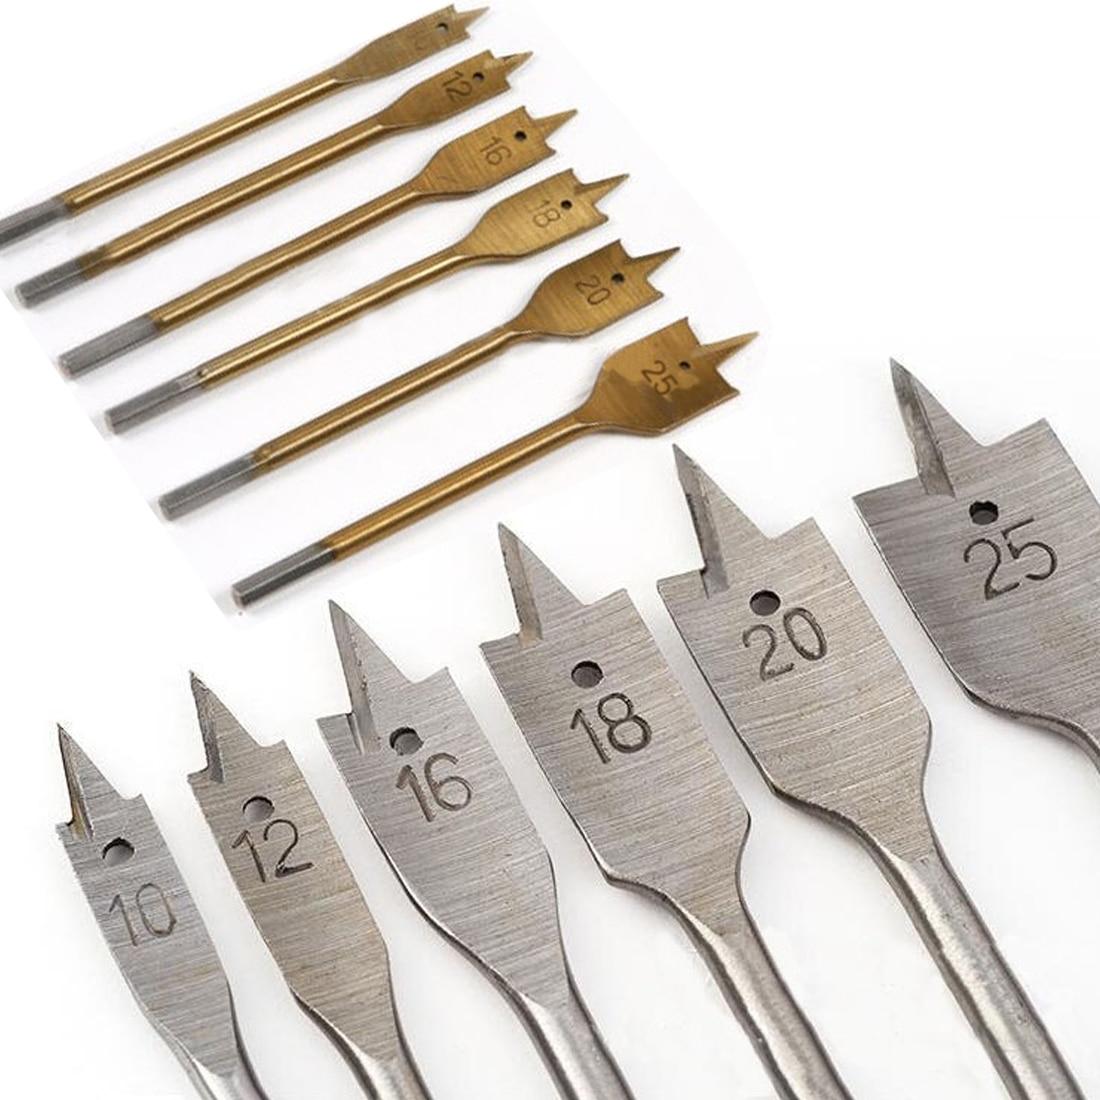 6pcs/set 10mm-25mm Flat Drill Long High-carbon Steel Wood Flat Drill Set Woodworking Spade Drill Bits  Woodworking Hand Tool